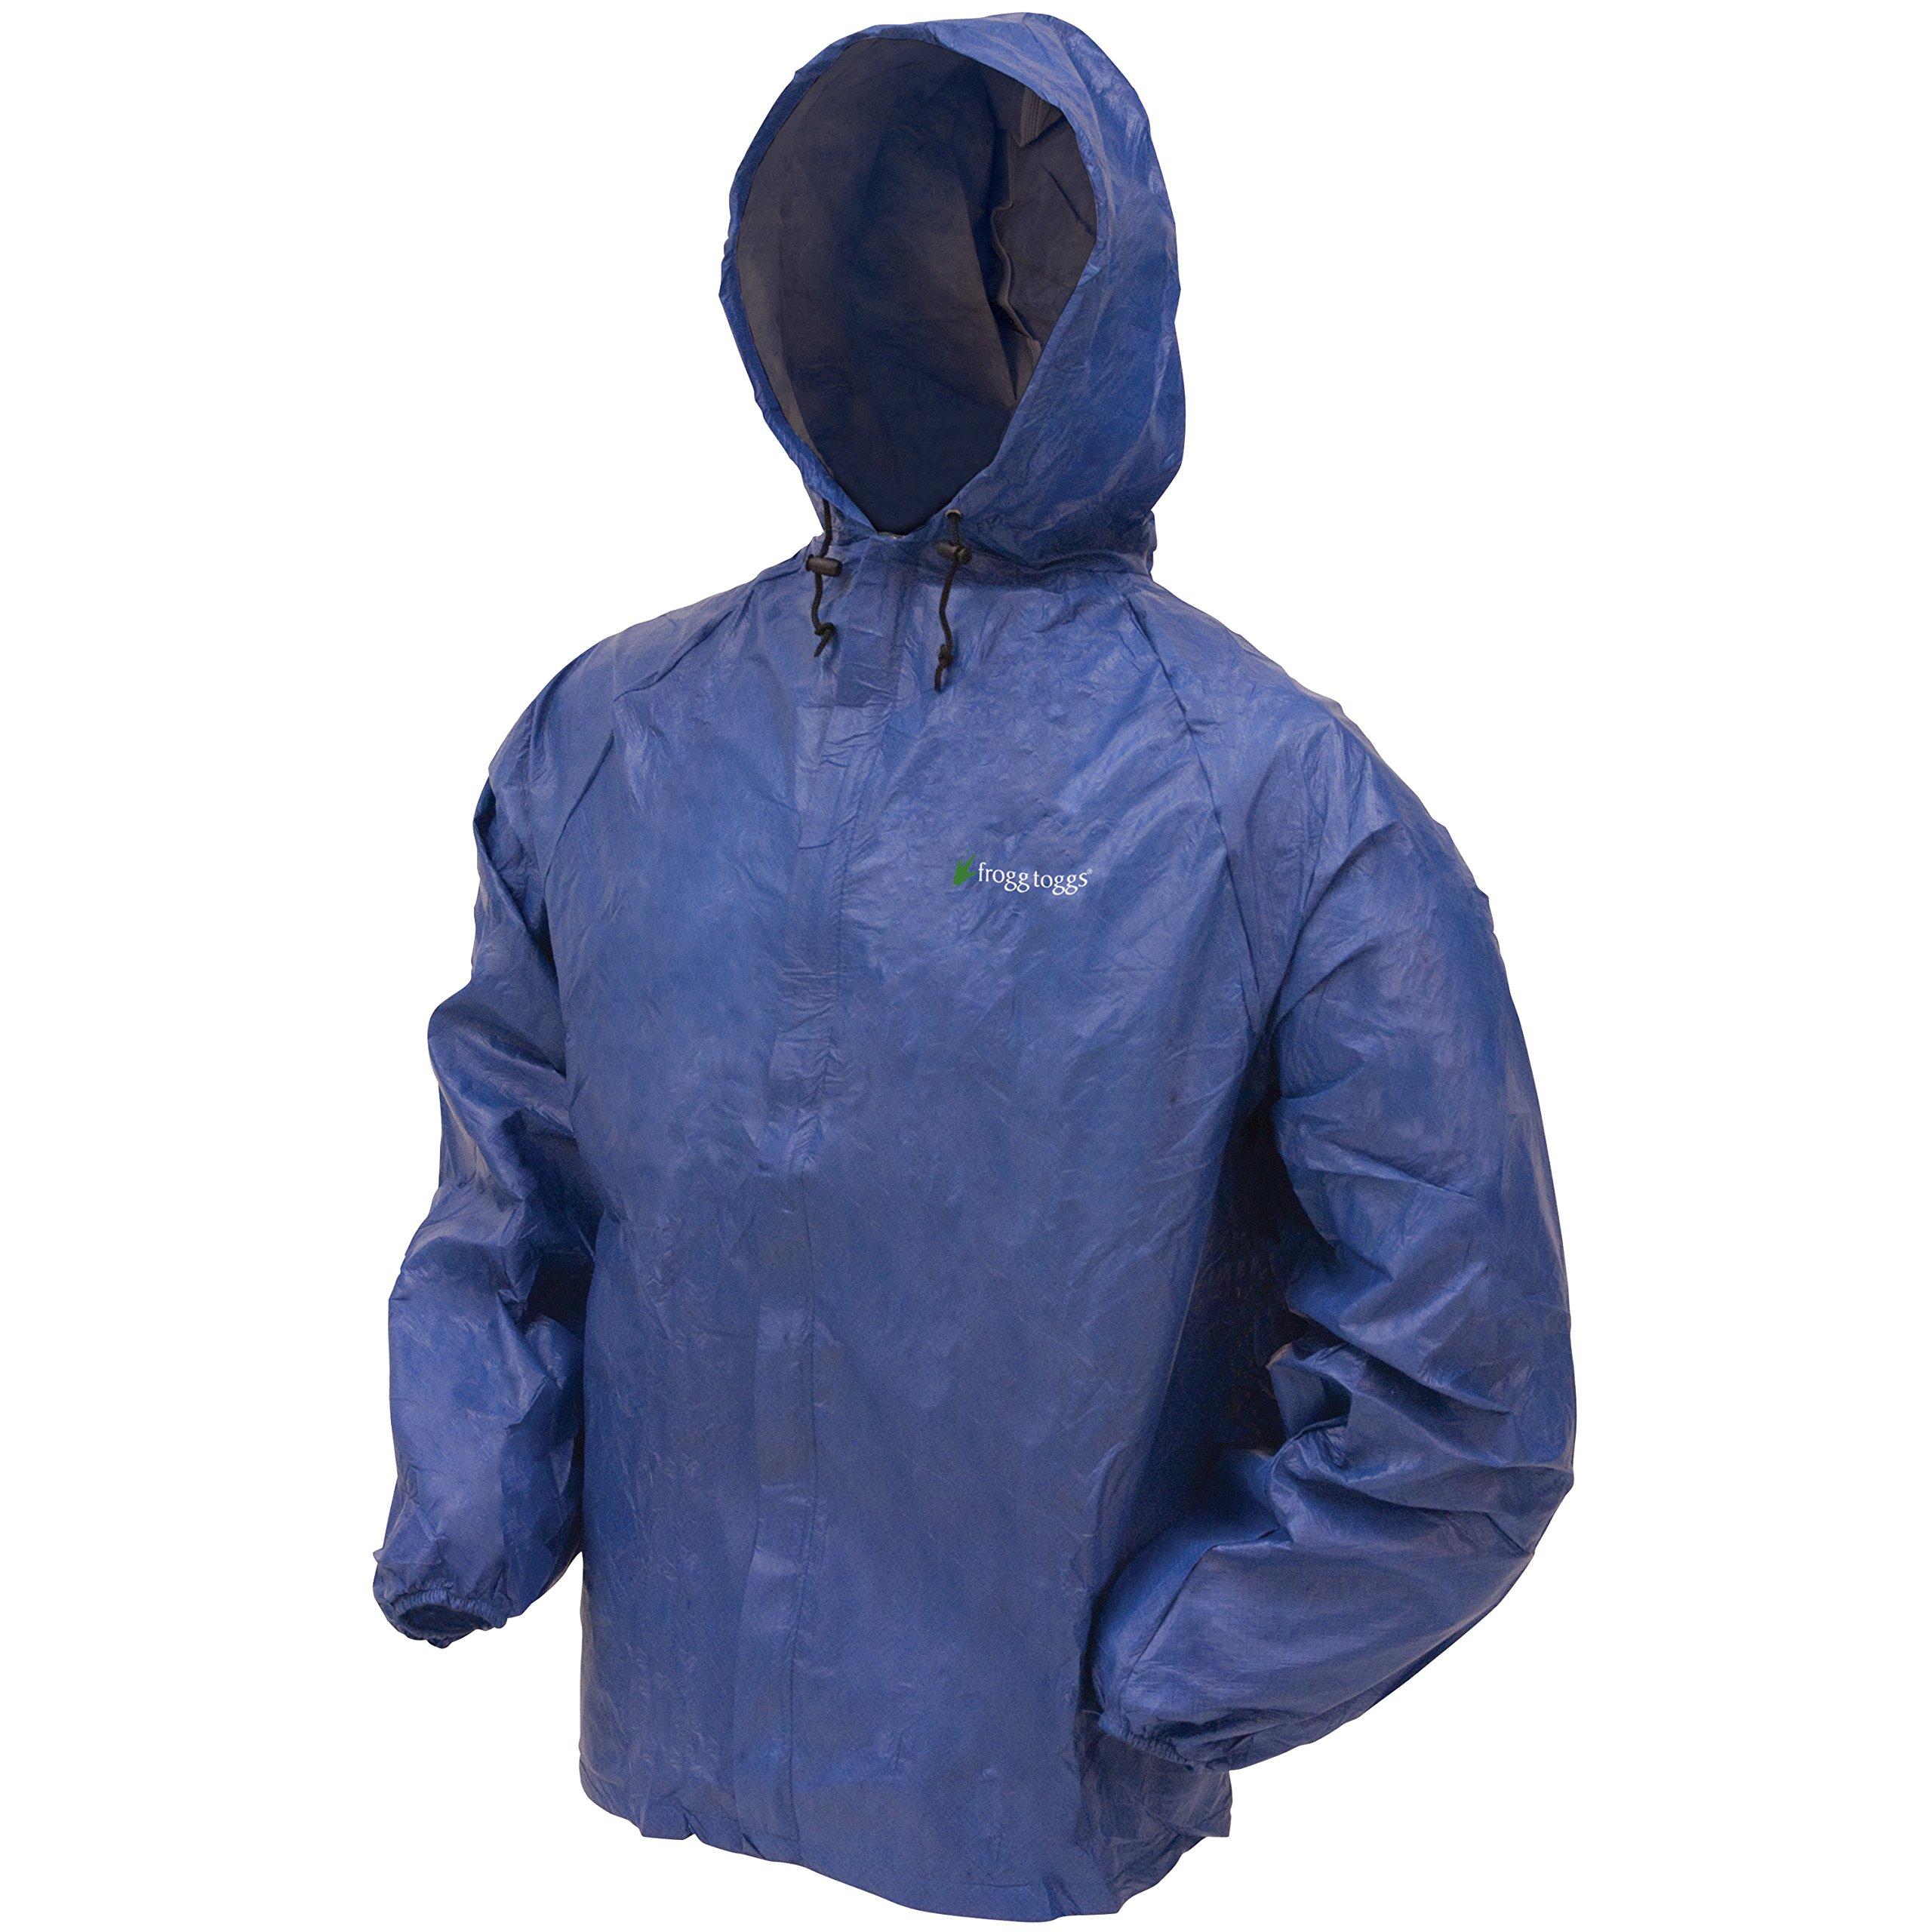 Frogg Toggs Ultra-Lite2 Rain Jacket, Blue, Size Small